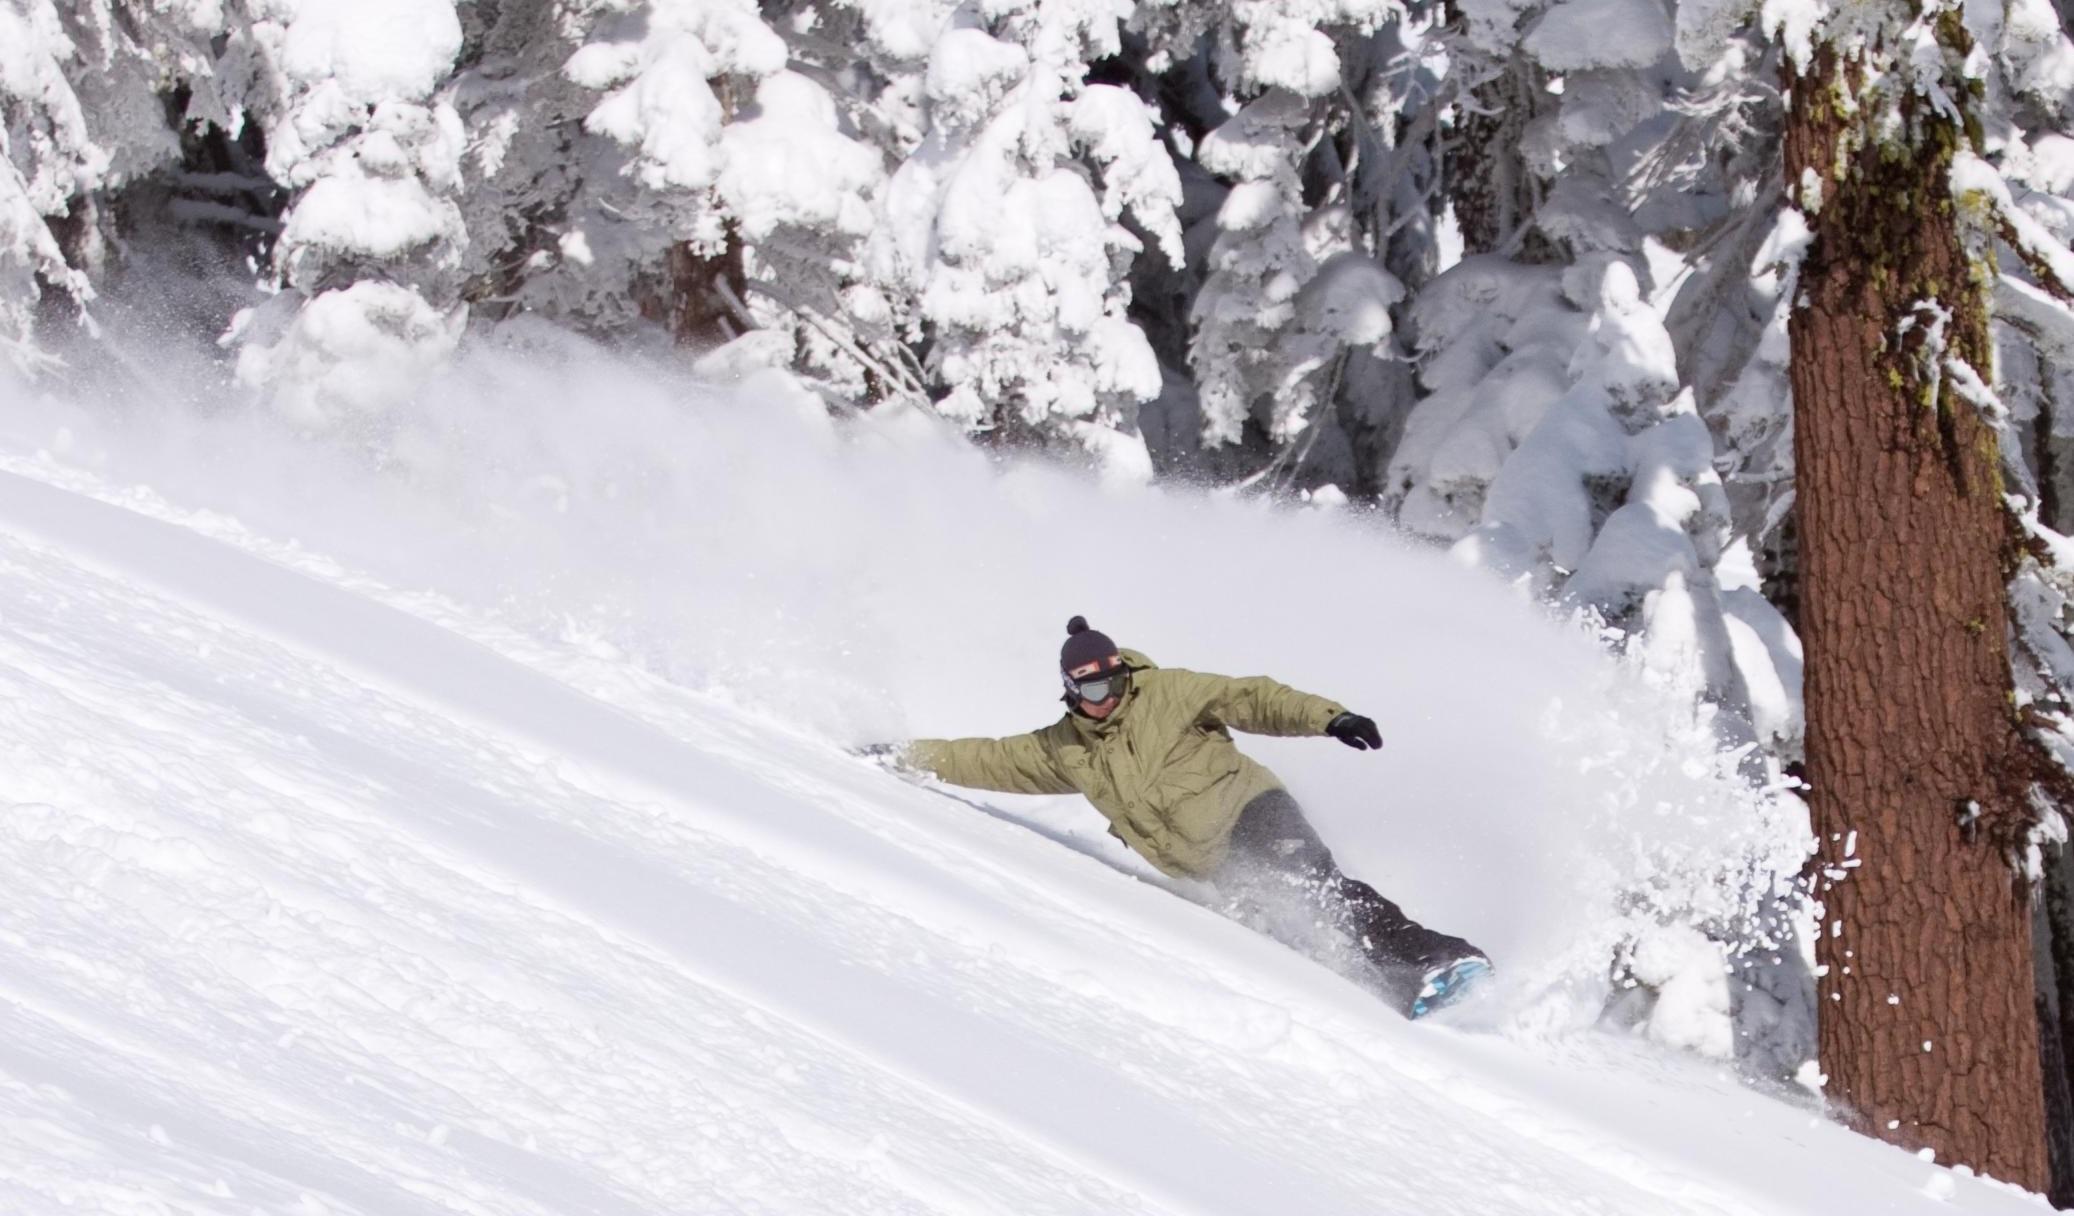 Snowboarding Wikipedia